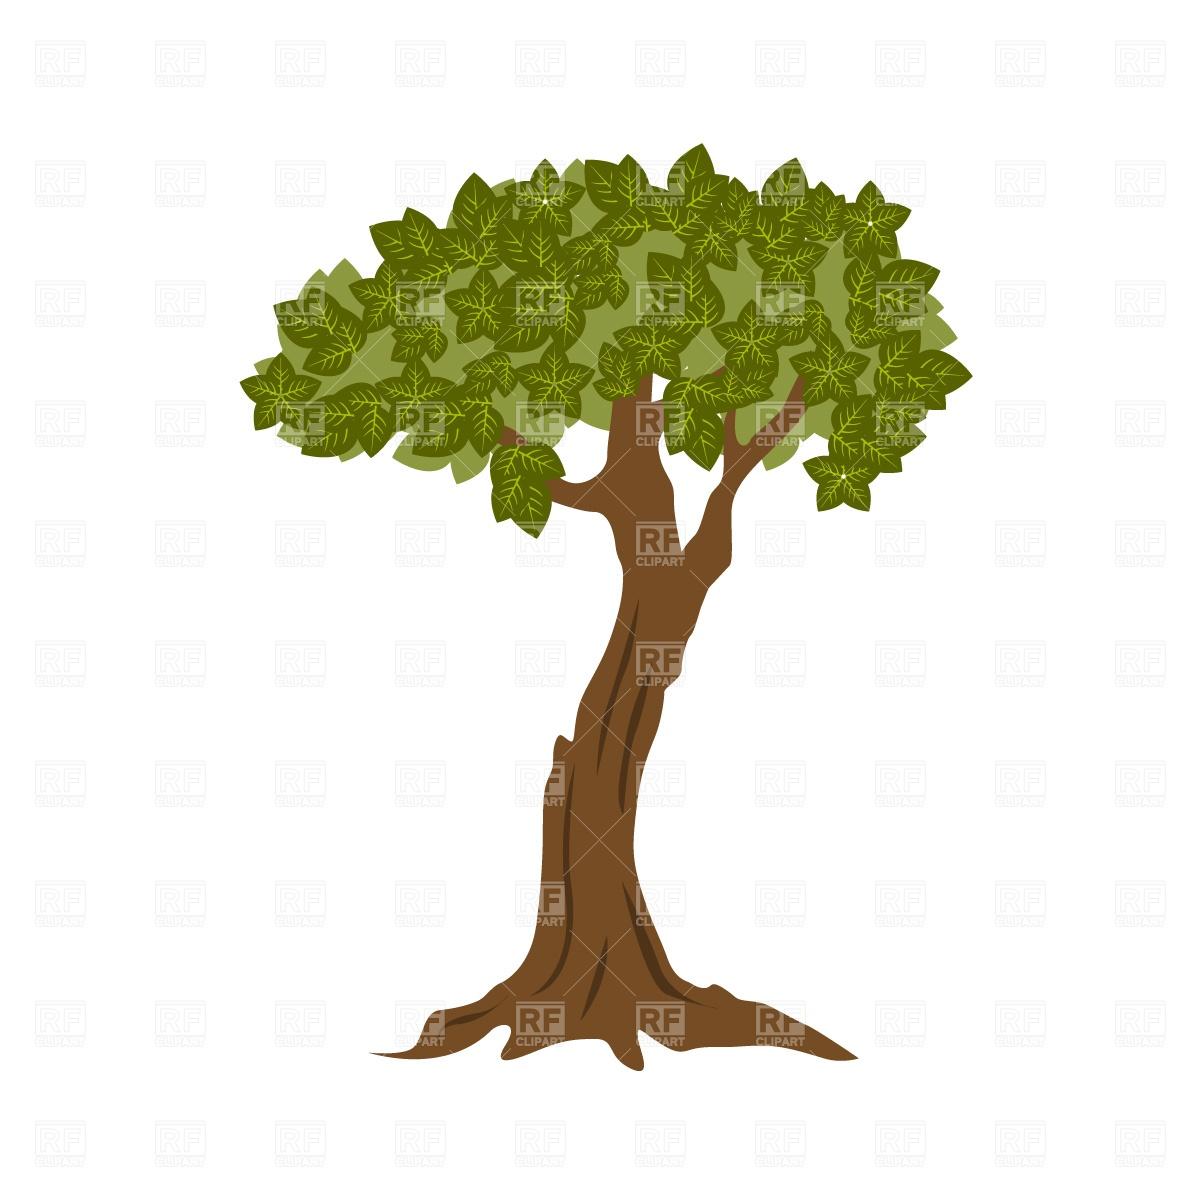 1200x1200 Foliage Bonsai Tree Vector Image Vector Artwork Of Plants And